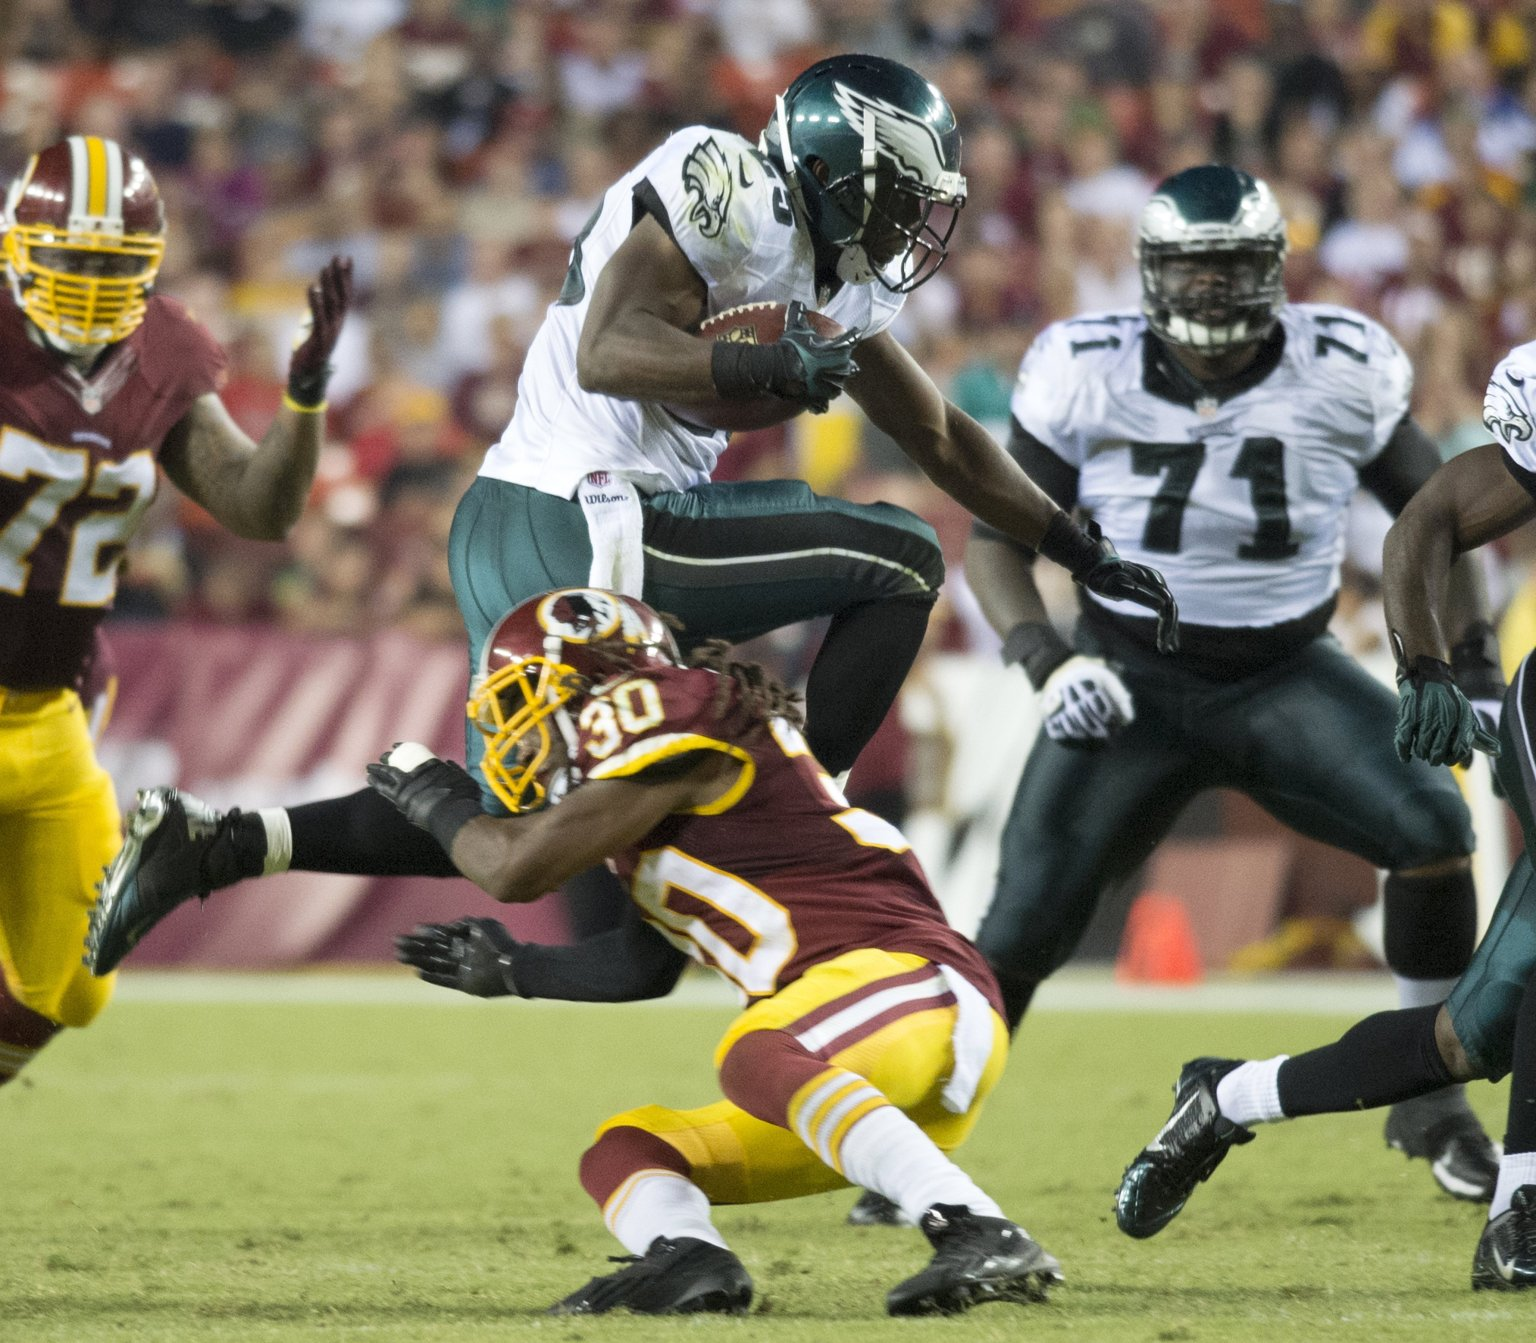 LeSean McCoy Touchdown Eagles RB Makes Washington Look Silly